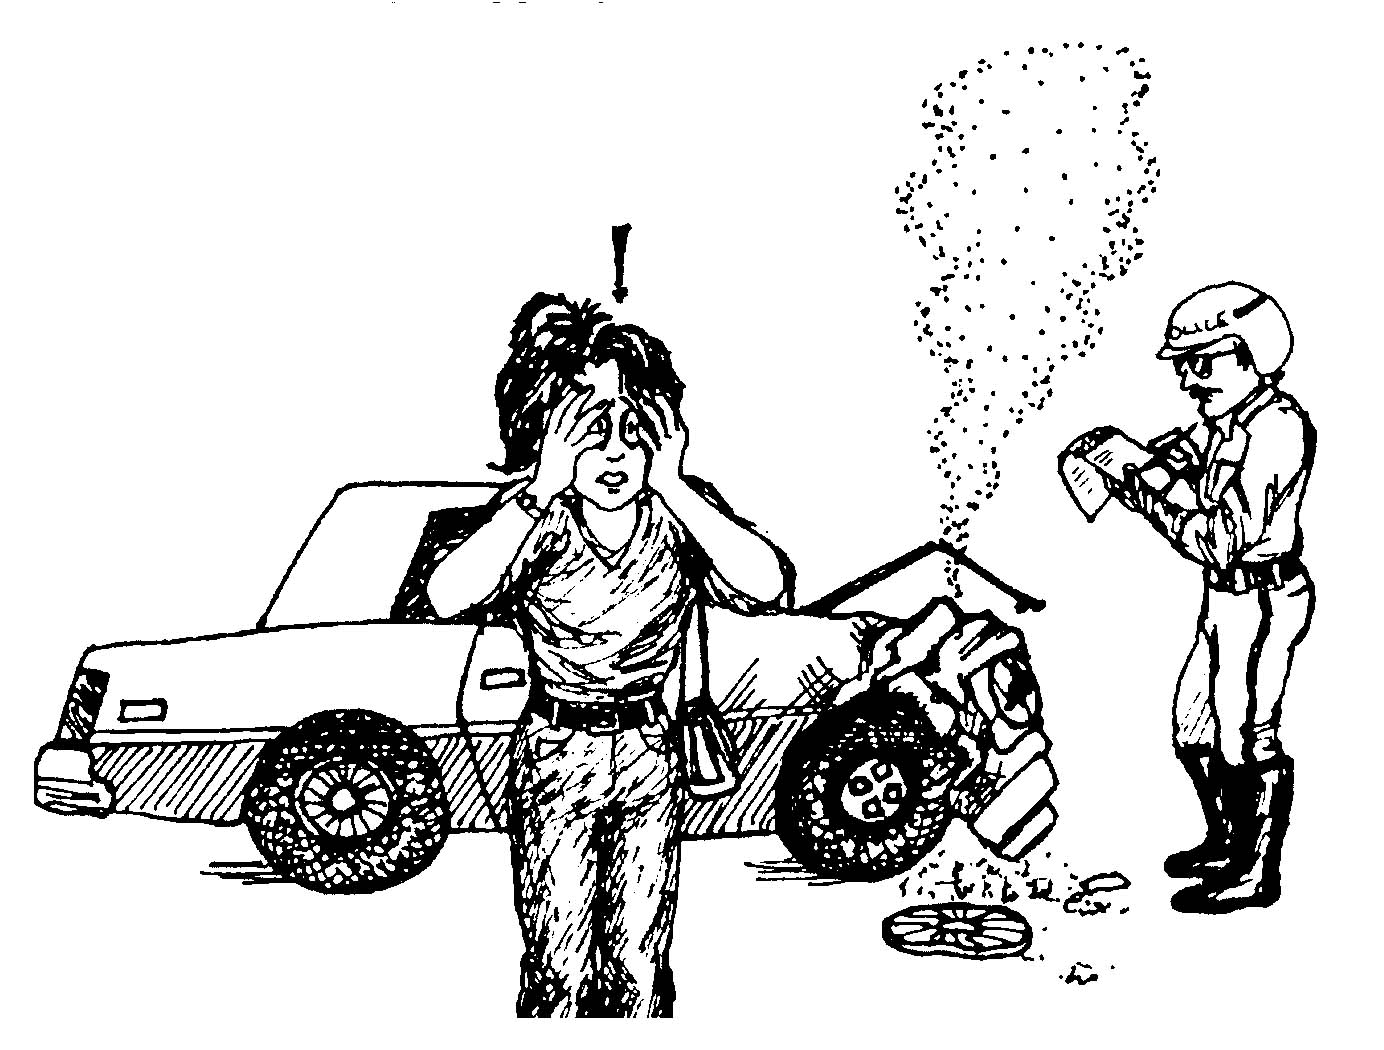 car accident prone